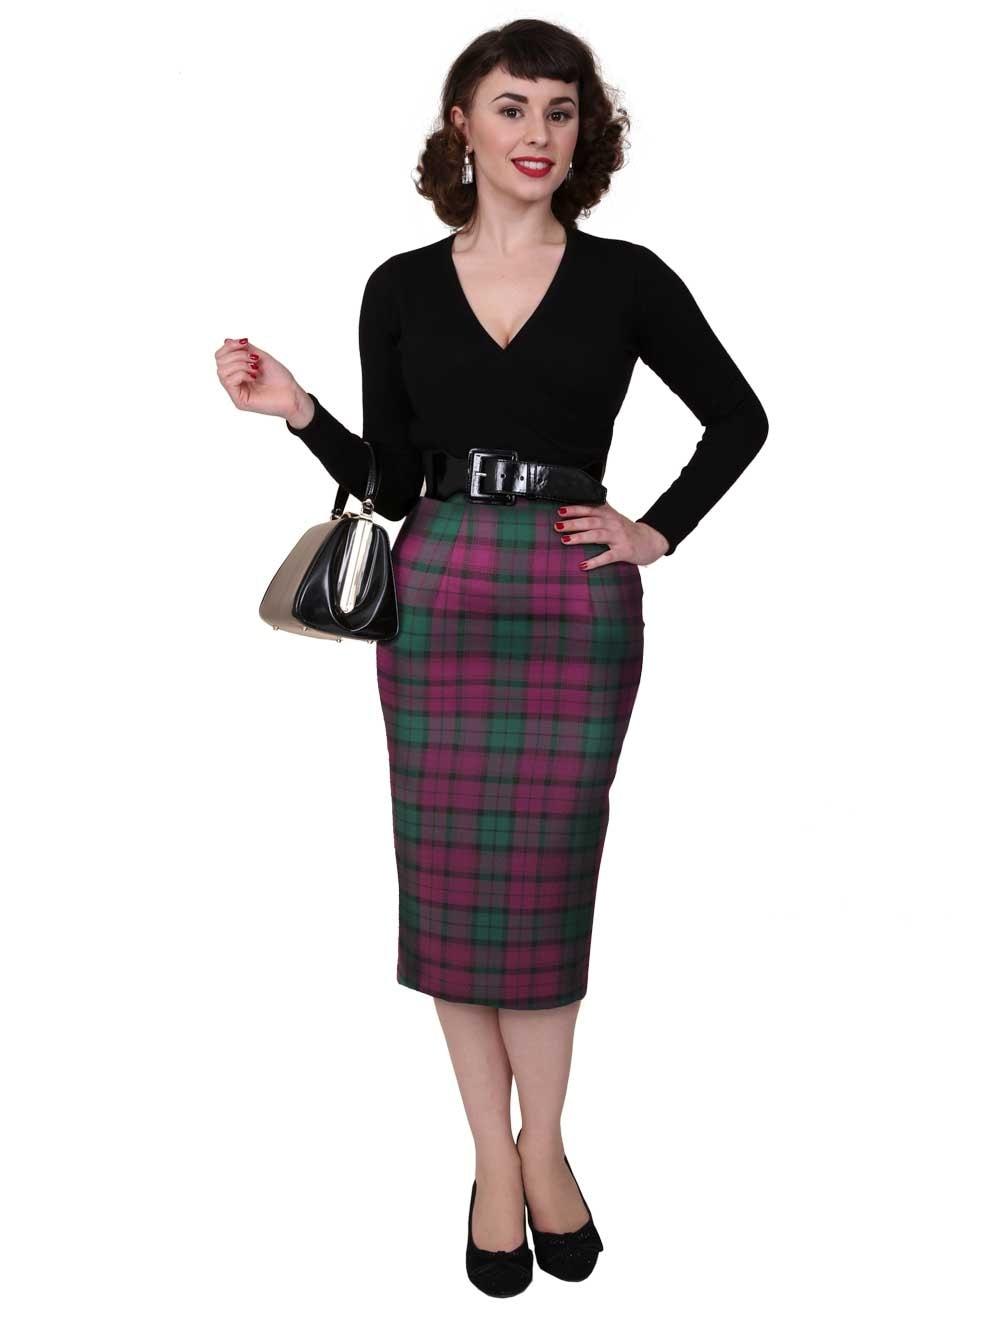 Pencil Skirt Heather Tartan from Vivien of Holloway